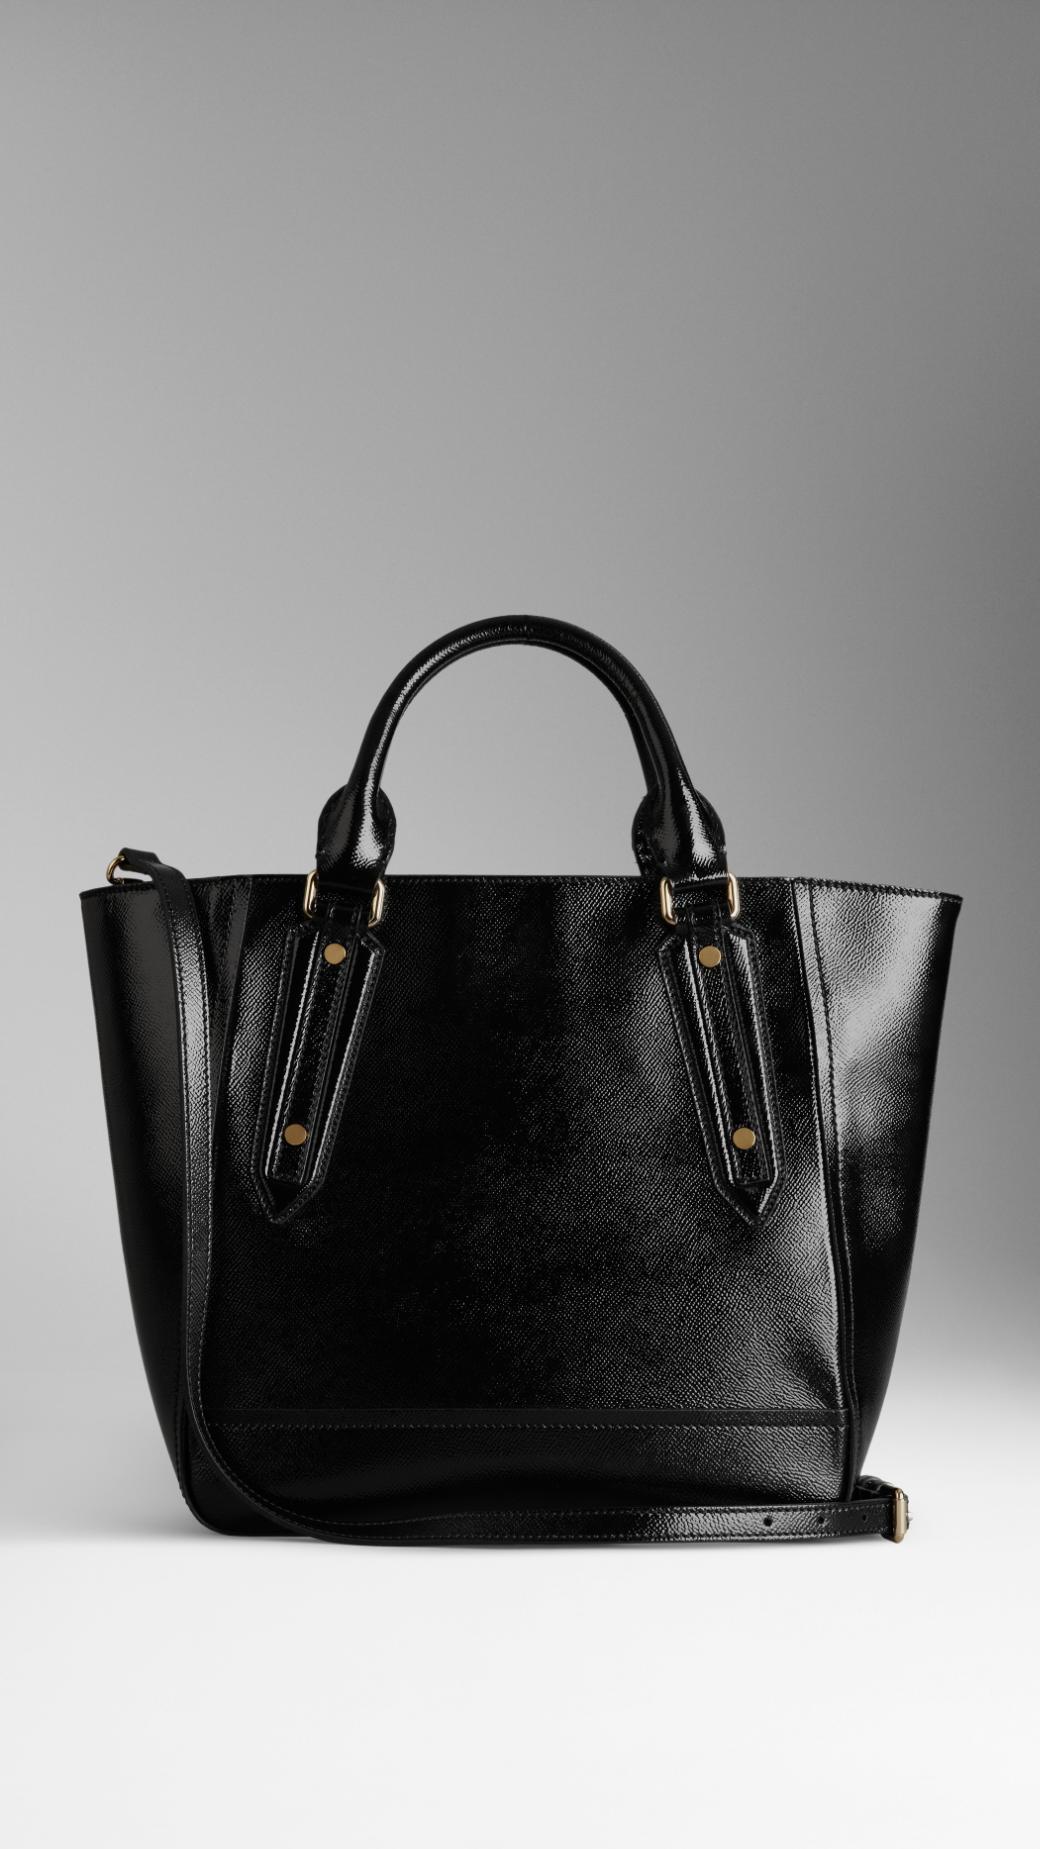 Lyst - Burberry Medium Patent London Leather Tote Bag in Black d5e4241d55696